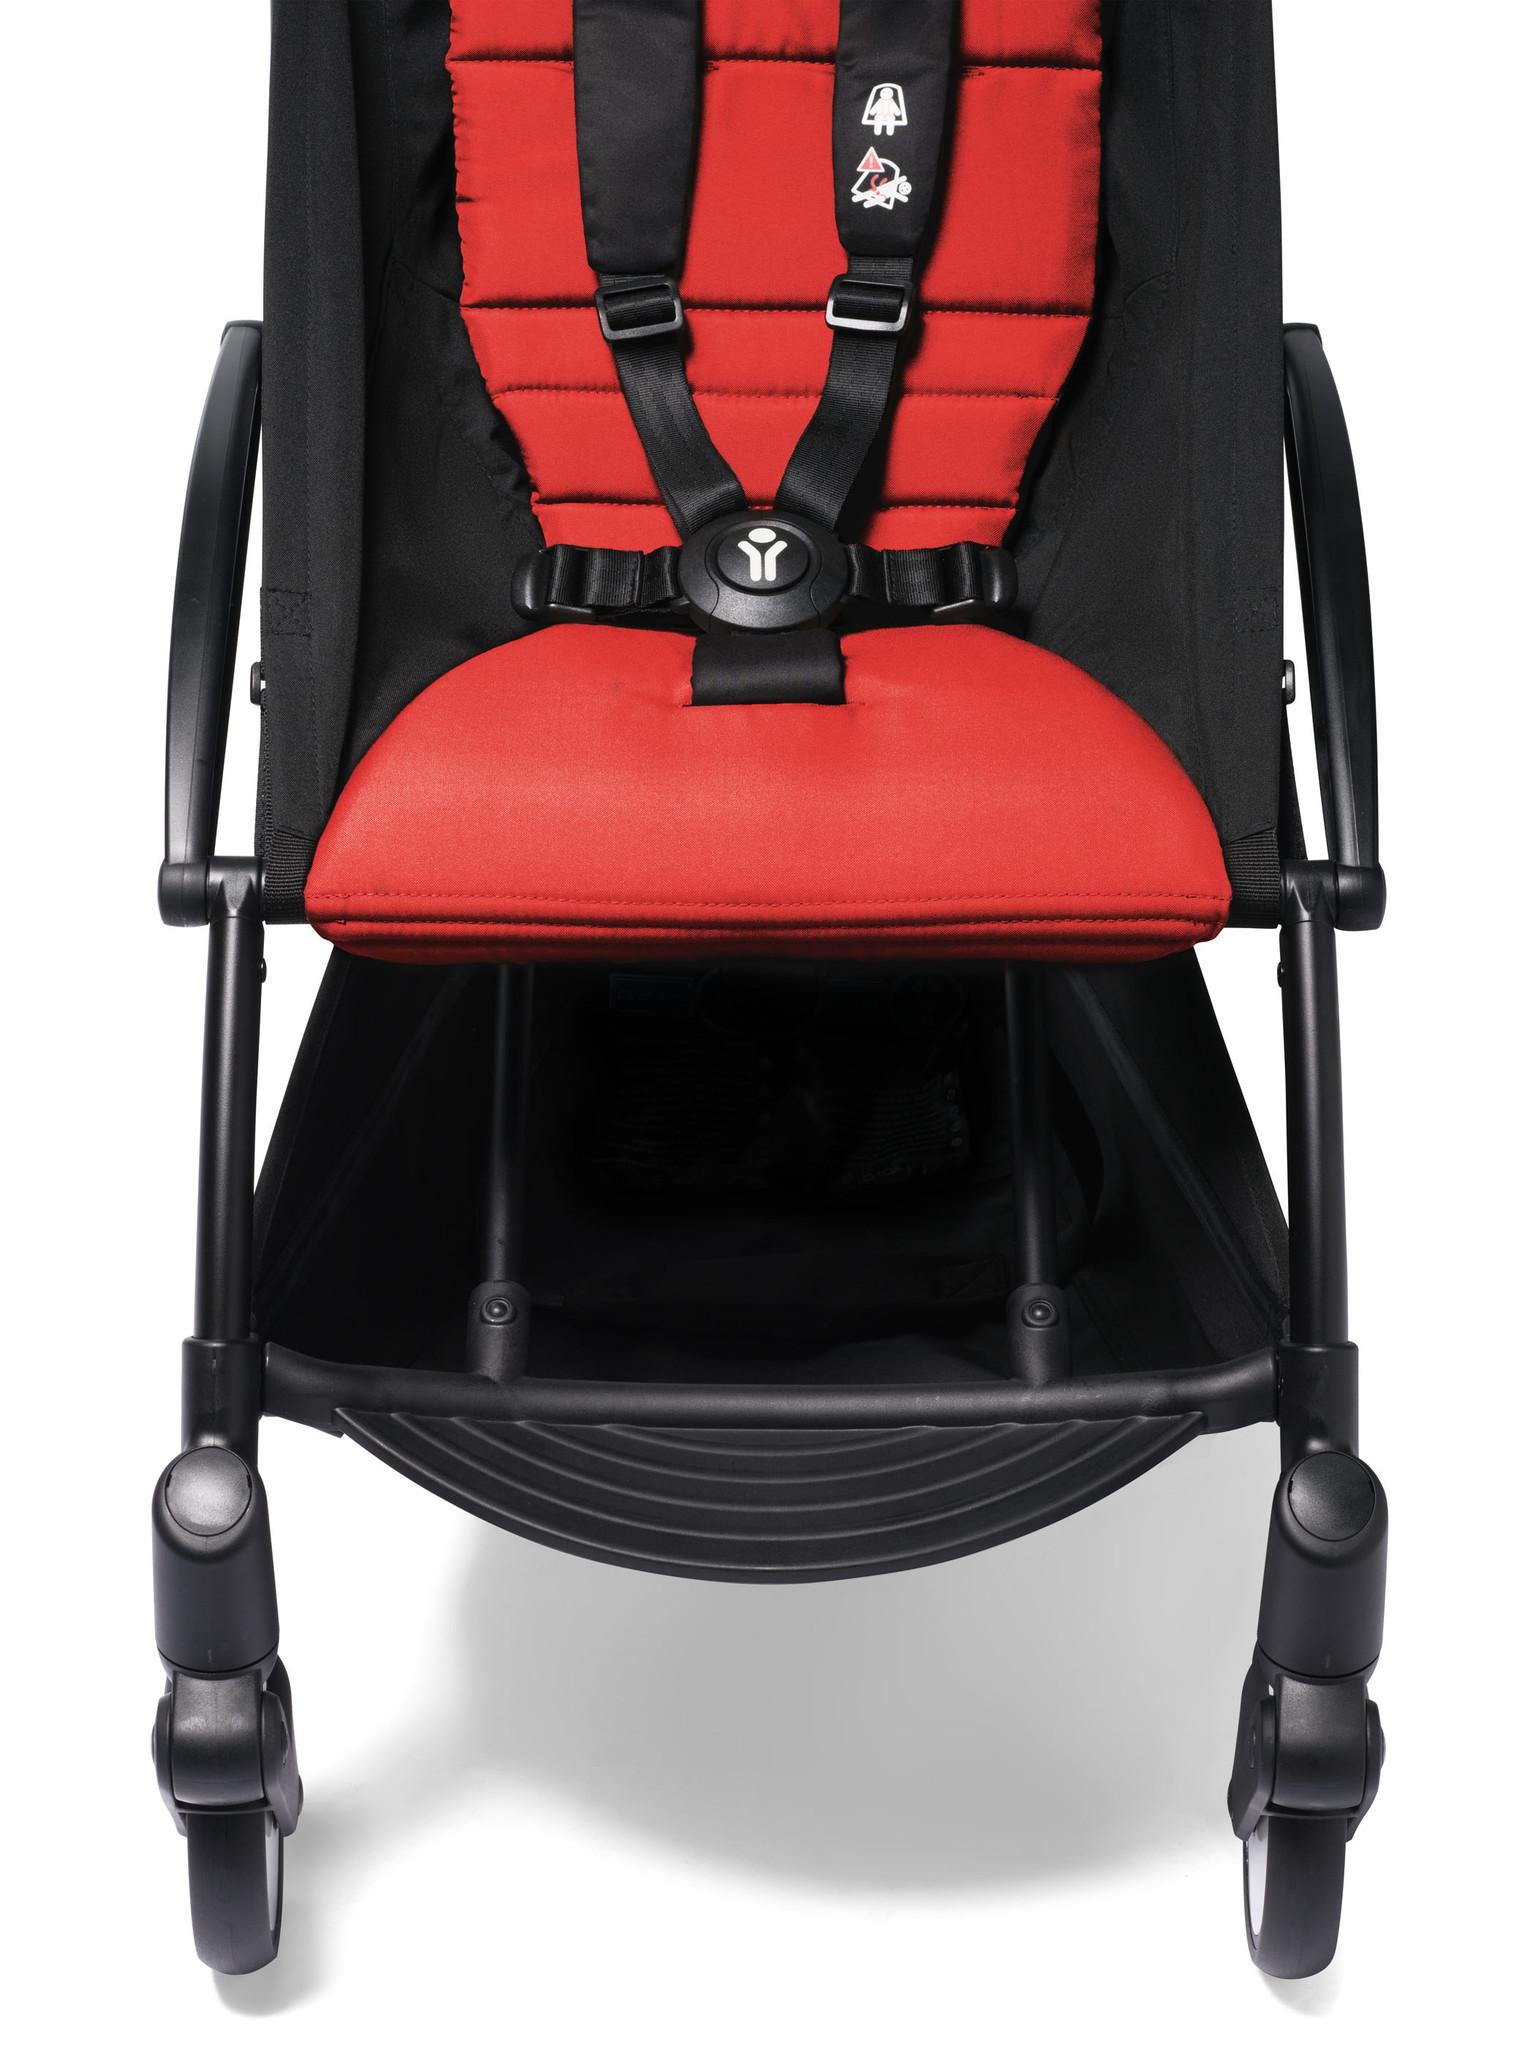 Babyzen Babyzen YOYO² buggy COMPLEET / FULL SET 0+ and 6+ rood frame wit incl. YOYO² BeSafe autostoel zwart